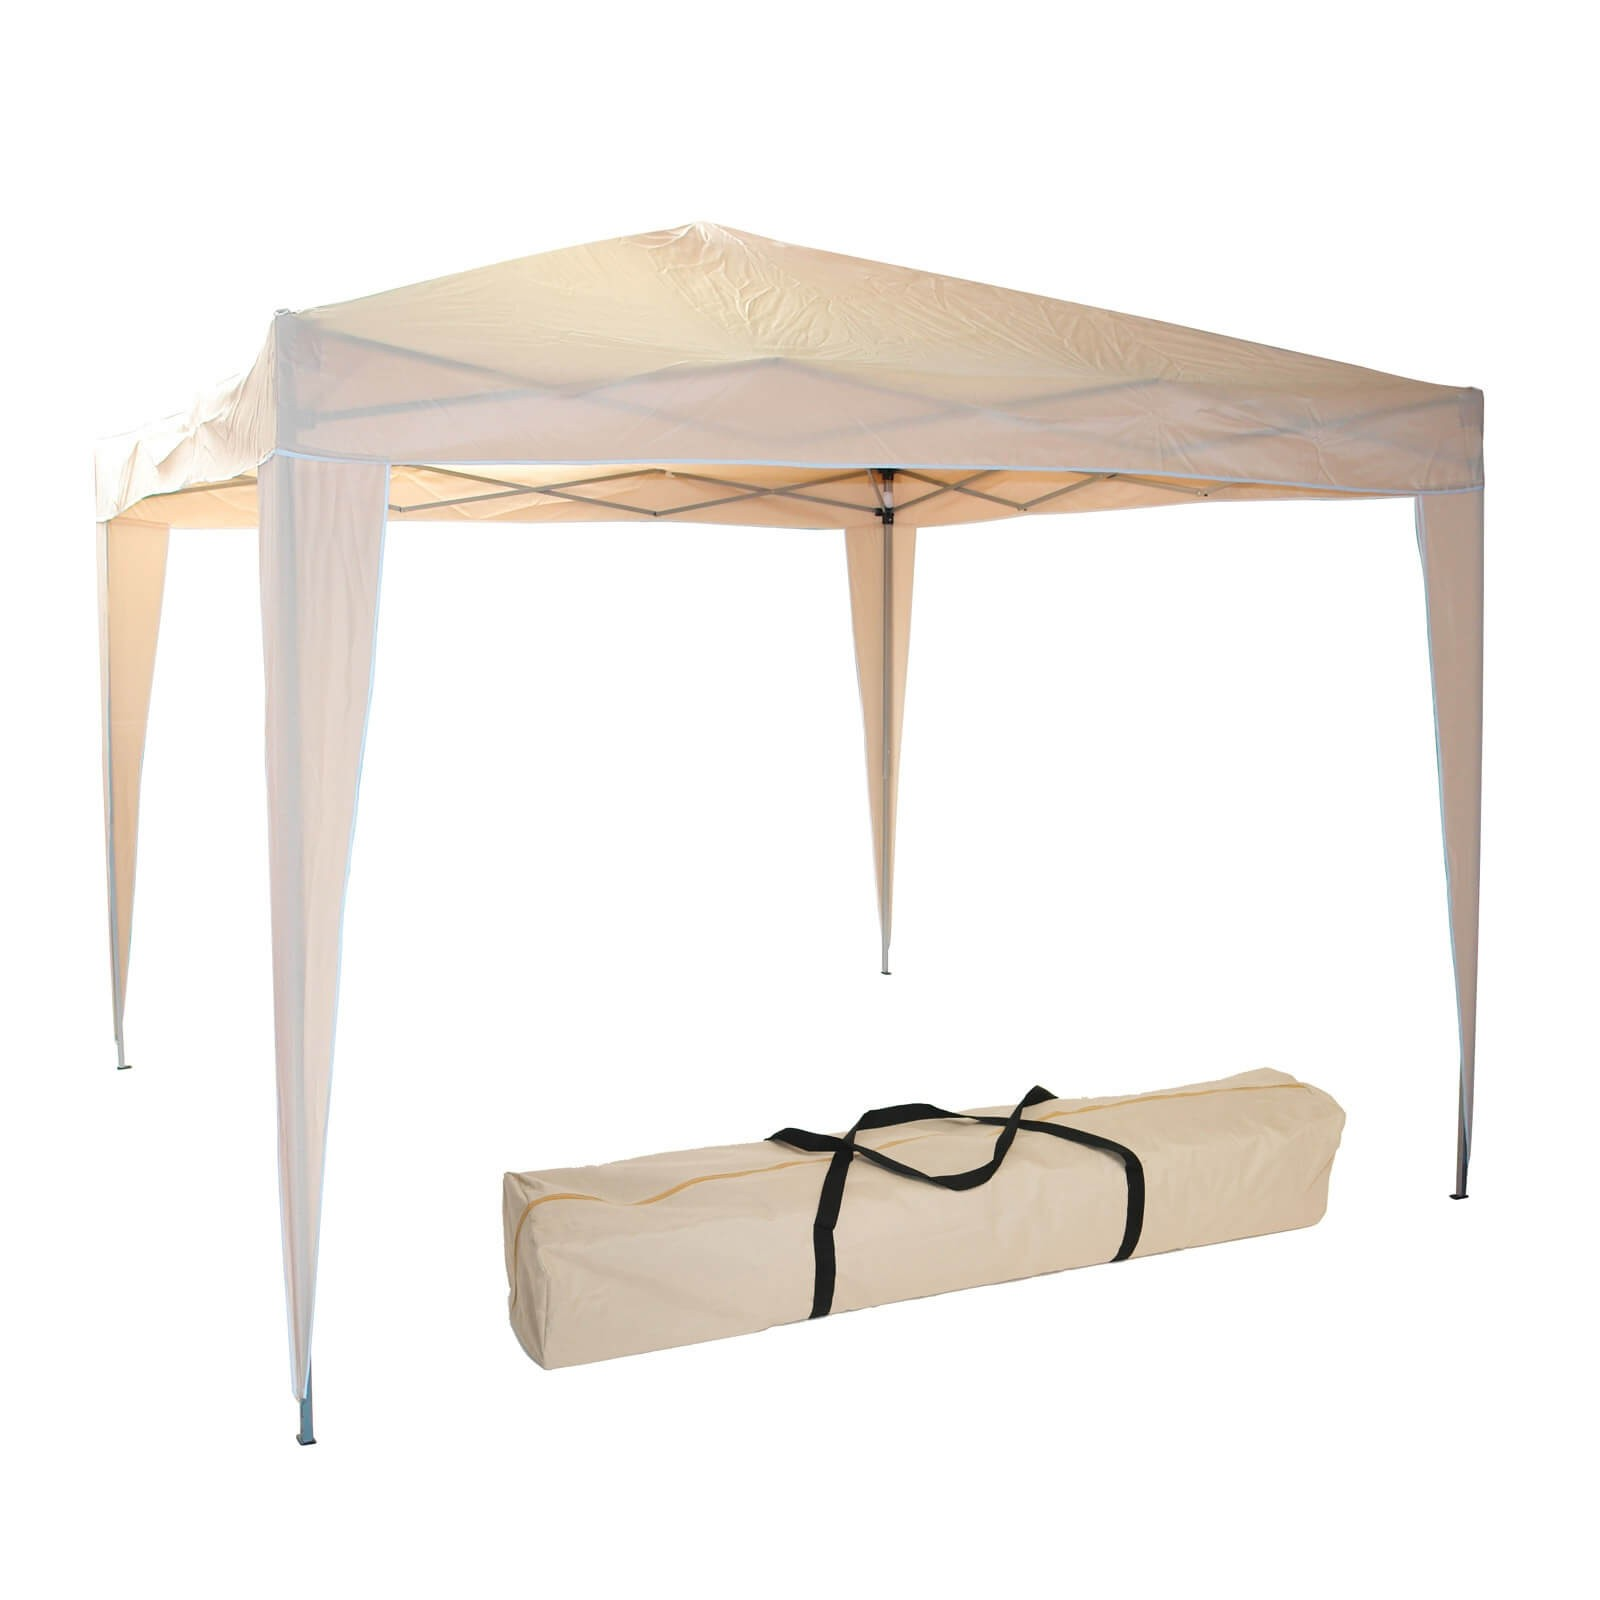 Dema Alu Gartenpavillon / Faltpavillon / Pavillon 3x3m Beige 41046